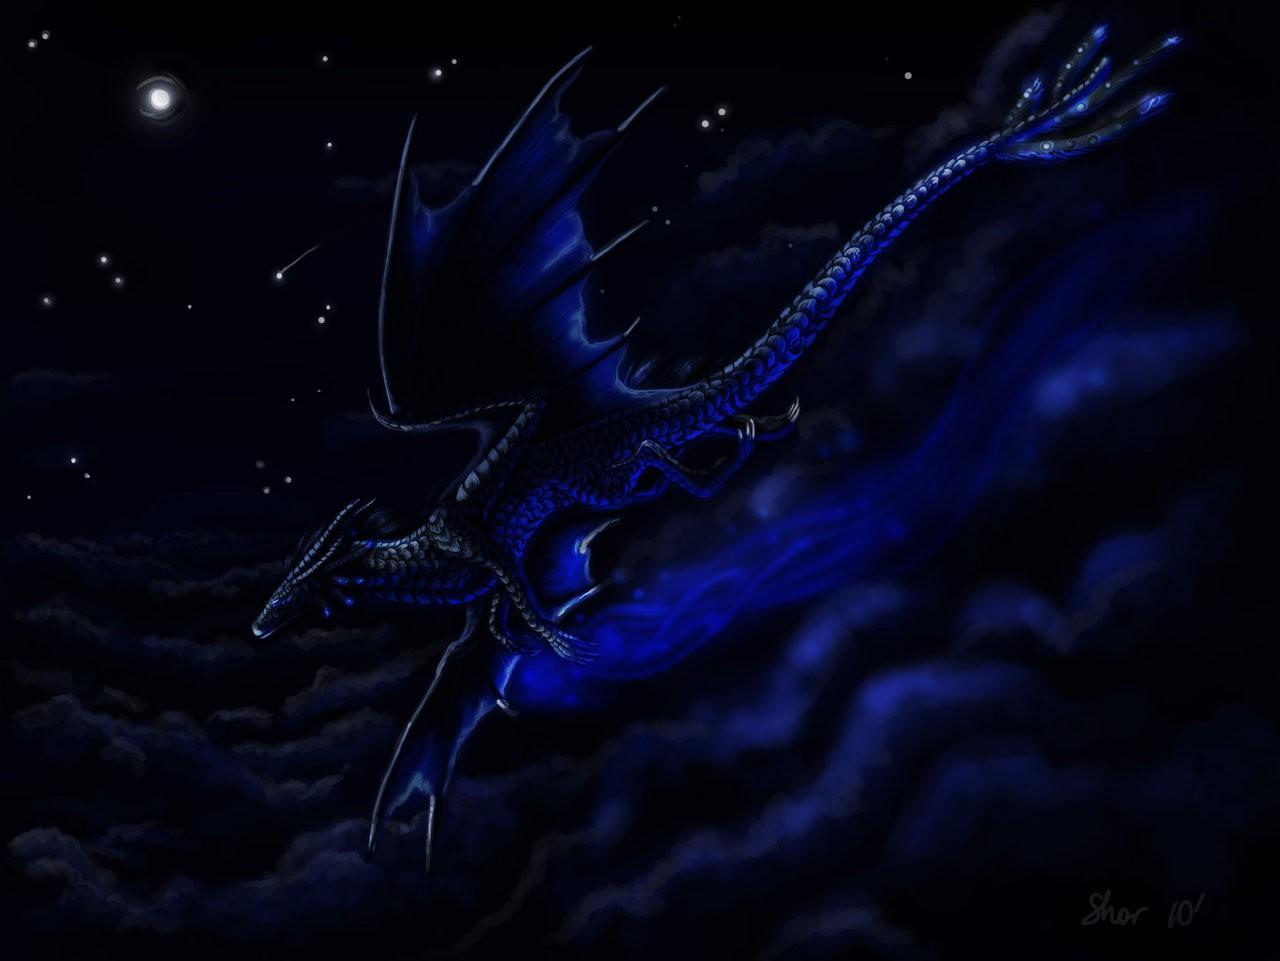 midnight dragon Wallpaper Background 27935 1280x961